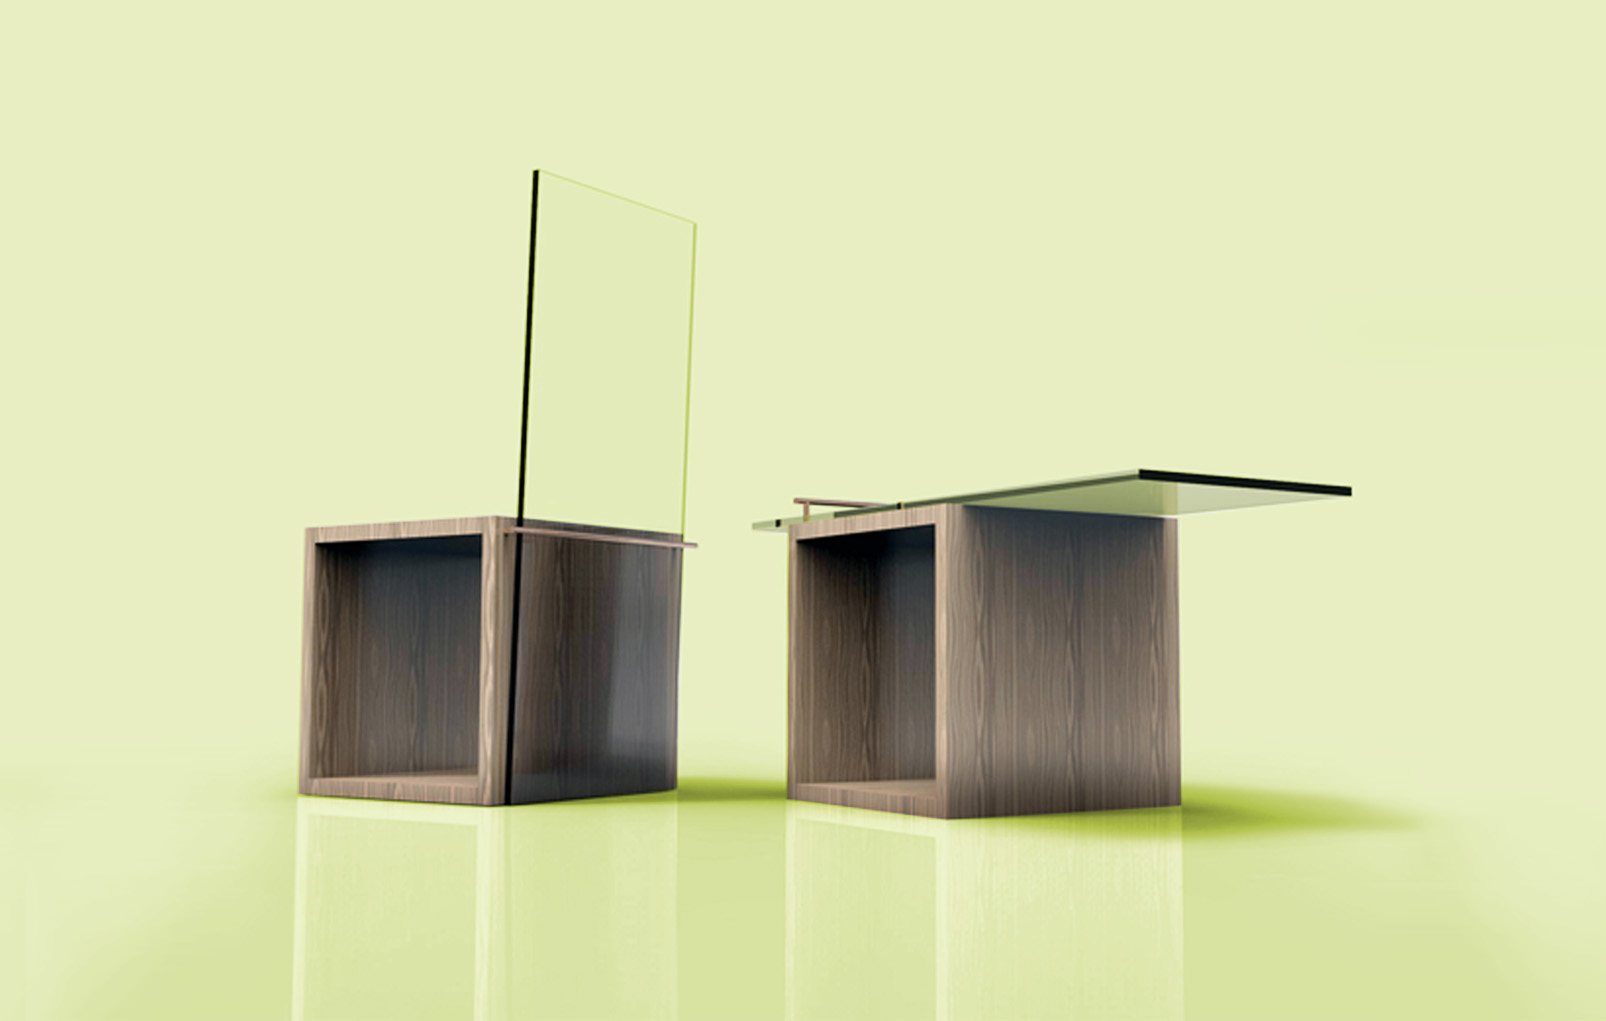 gudu-studio-table-chair